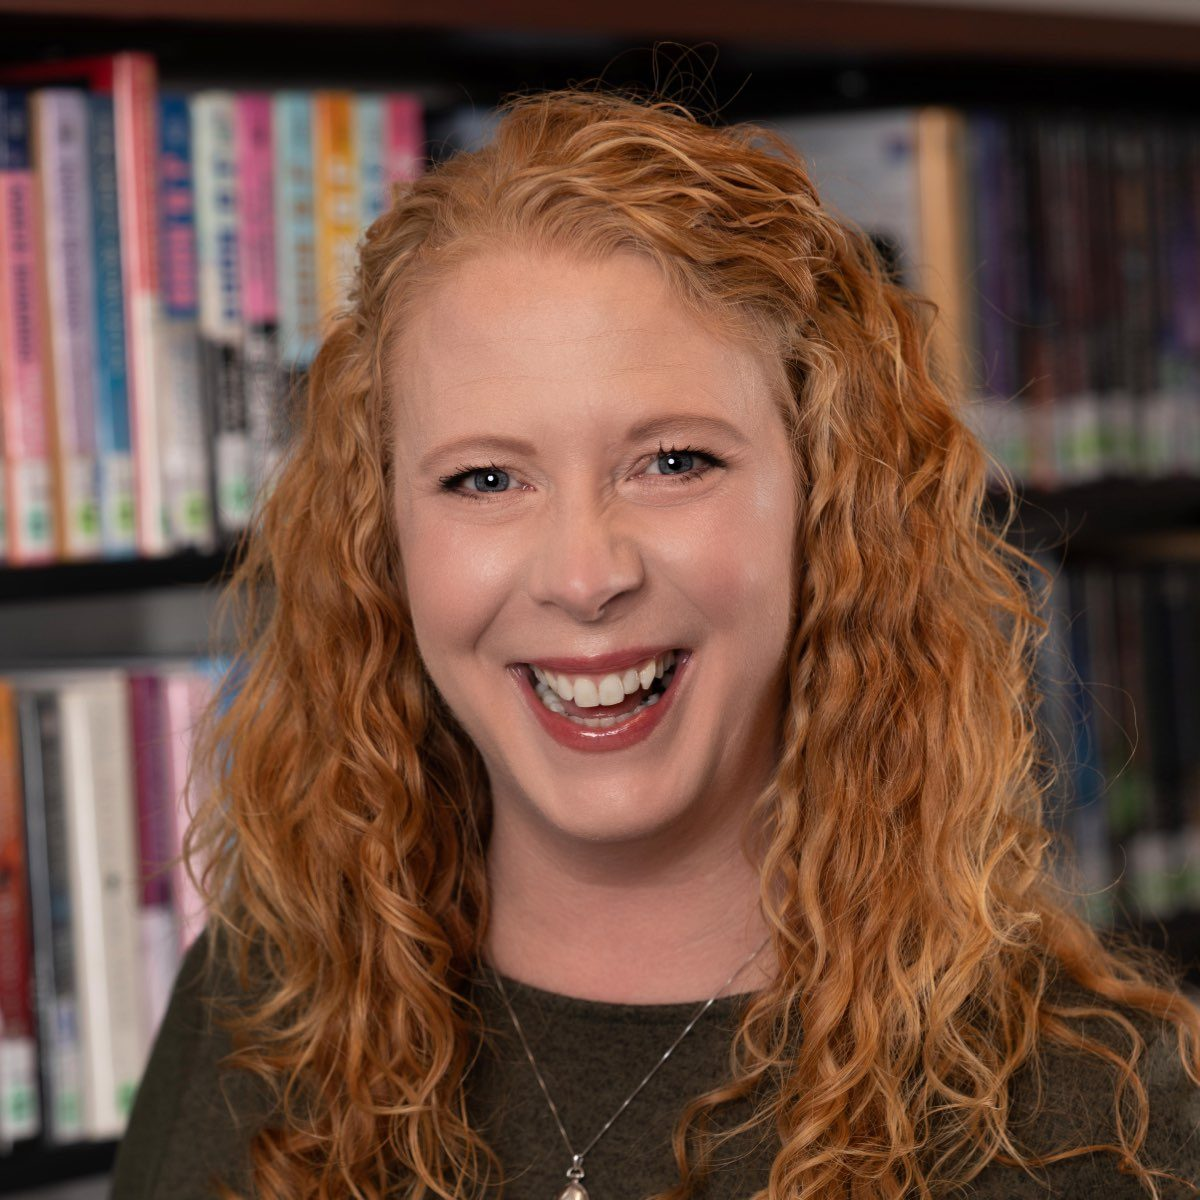 Katrina Kmak - Park City Library - Youth Services Librarian